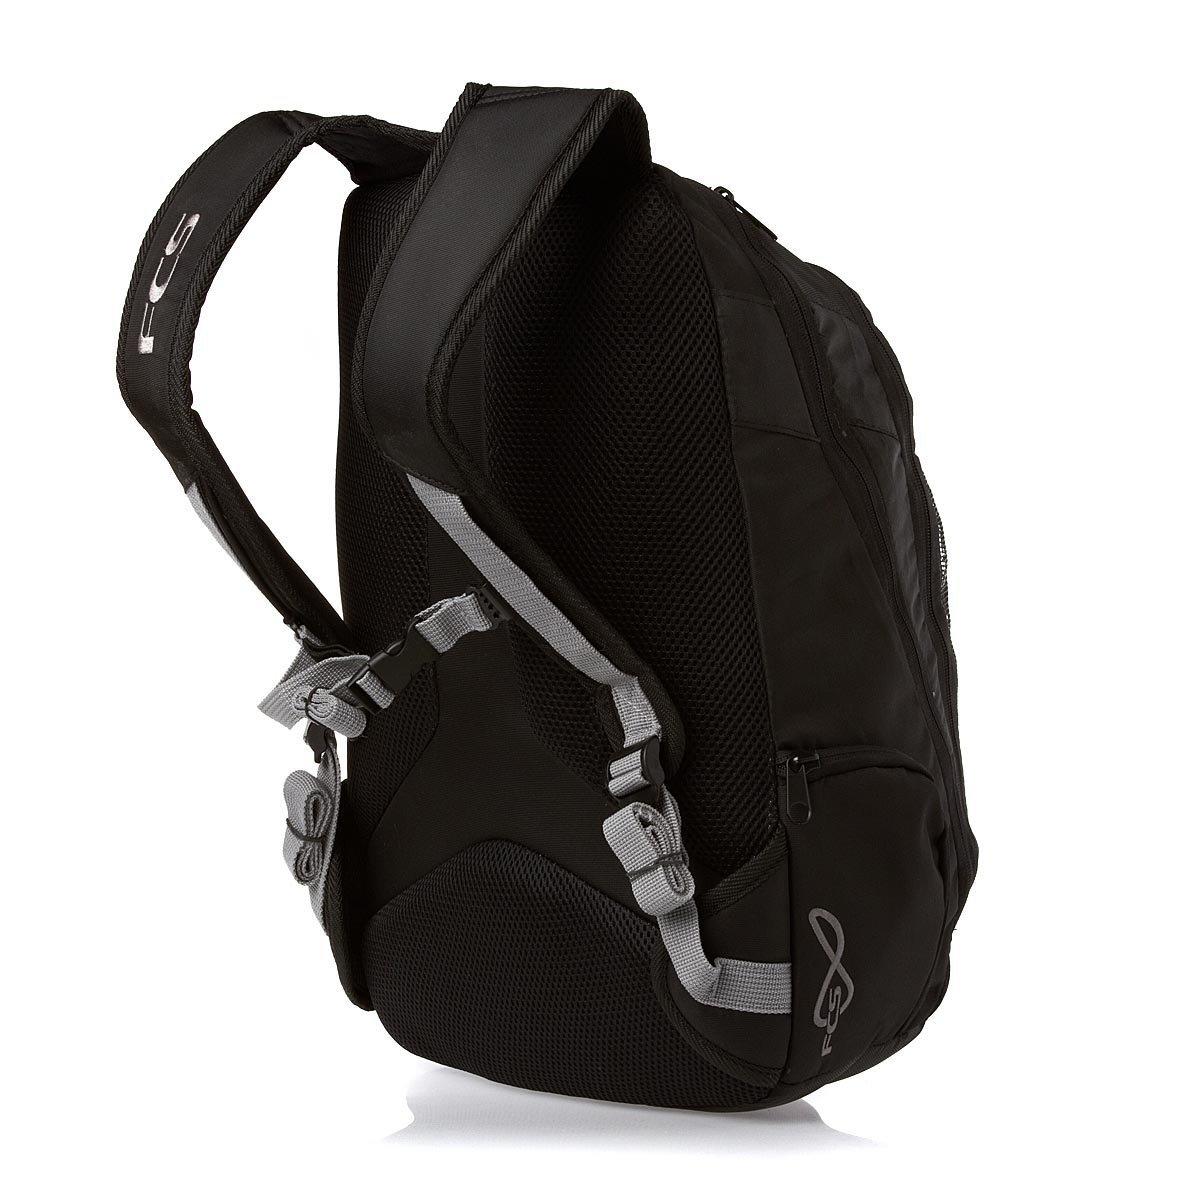 2aa75cd1345f2 Amazon.com  FCS IQ Surf Backpack One Size Black  Sports   Outdoors